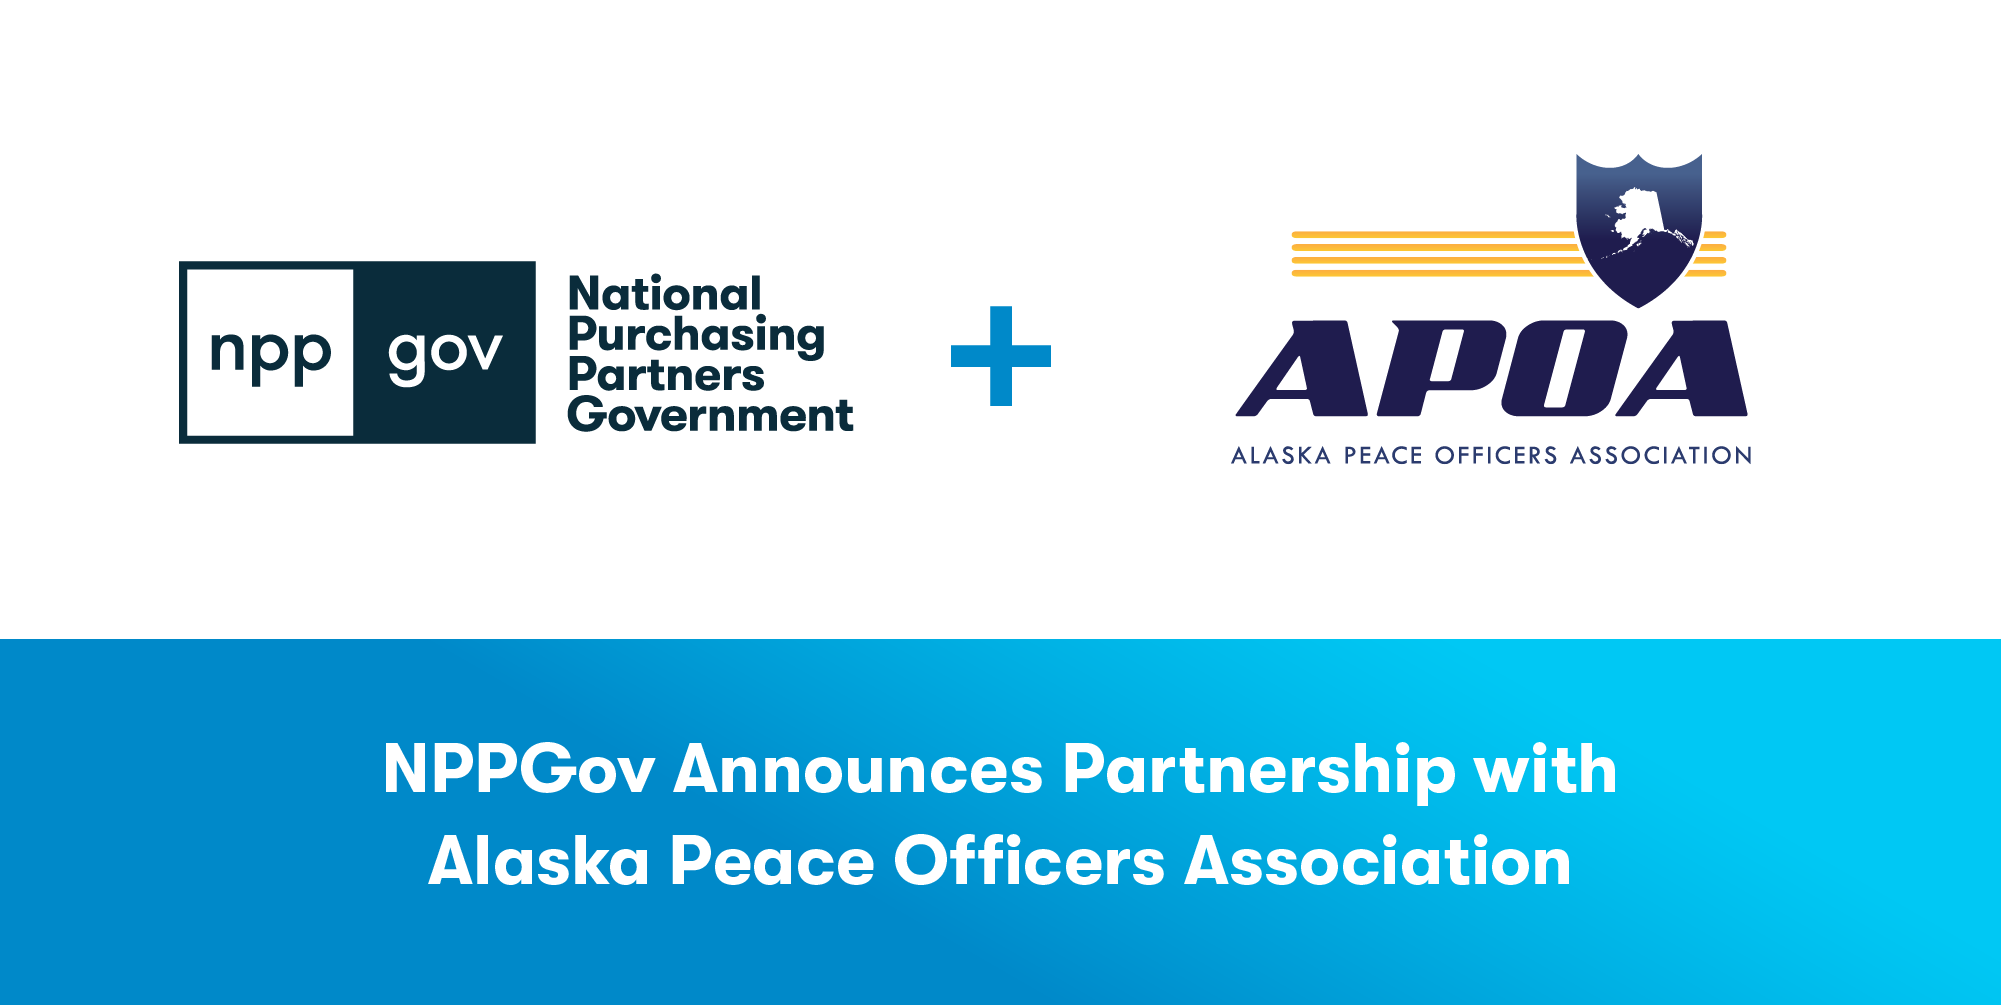 NPPGov Partners With Alaska Peace Officers Association